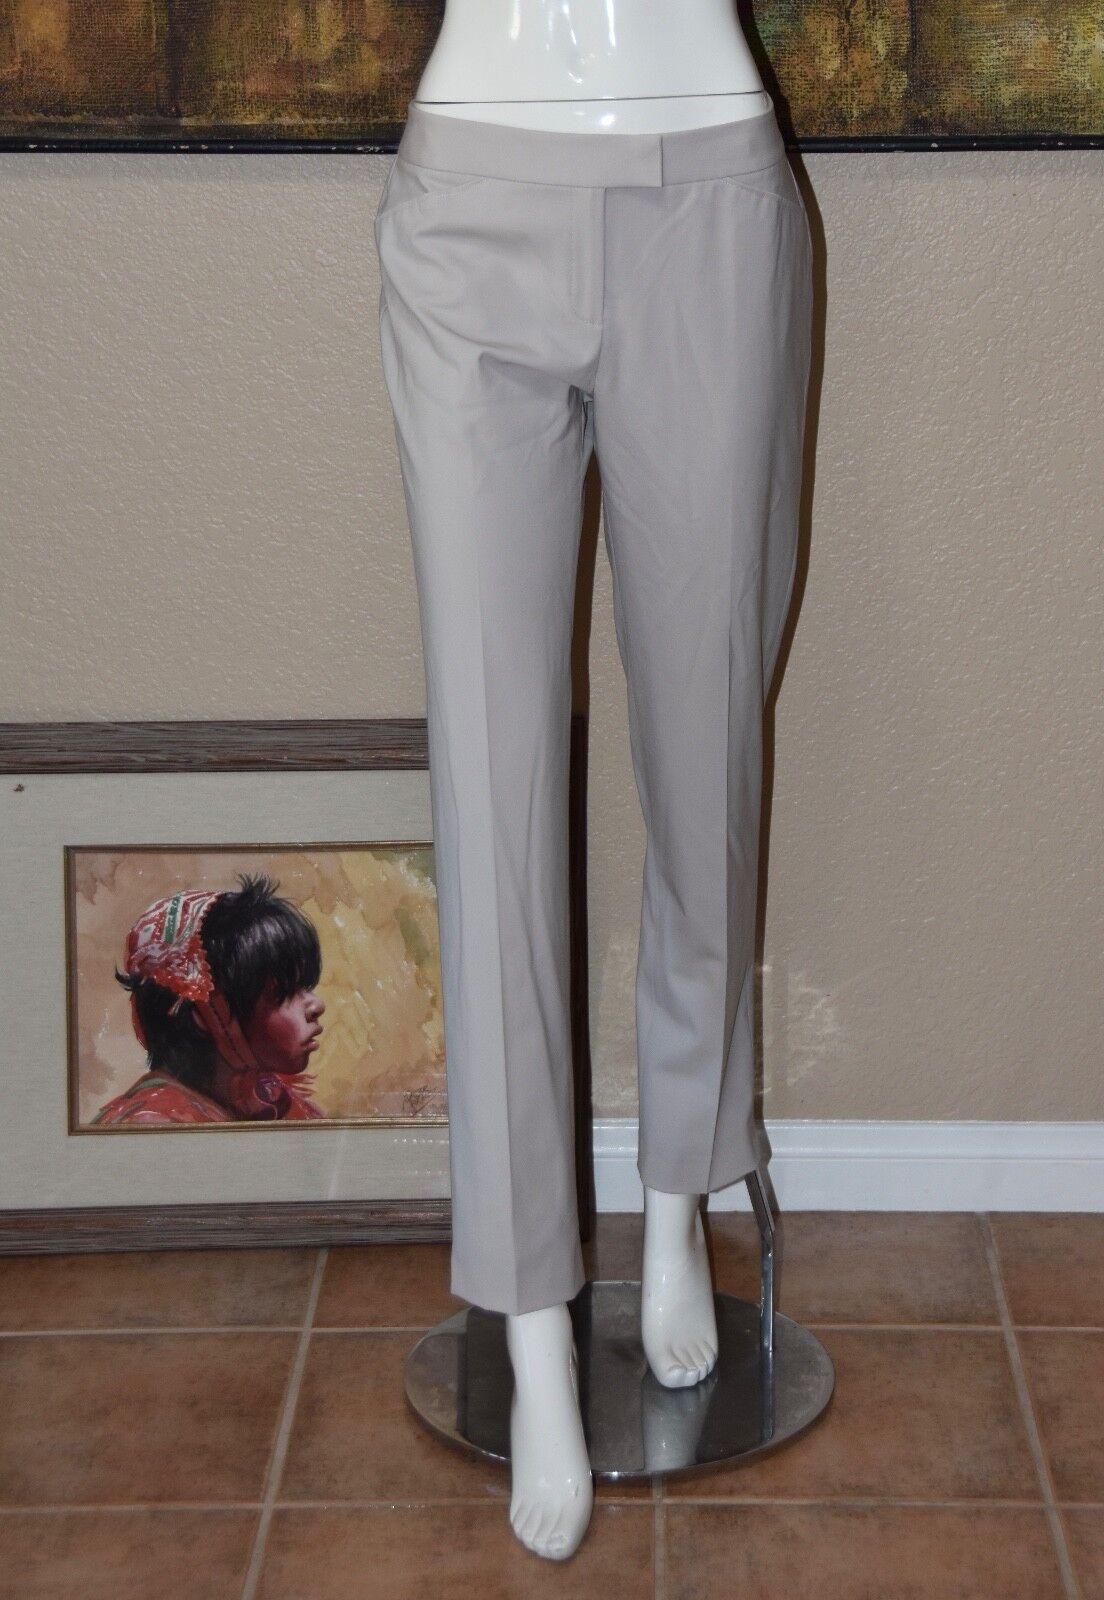 LAFAYETTE 148 NEW YORK Khaki Stretch Wool Pants Size 4 NEW